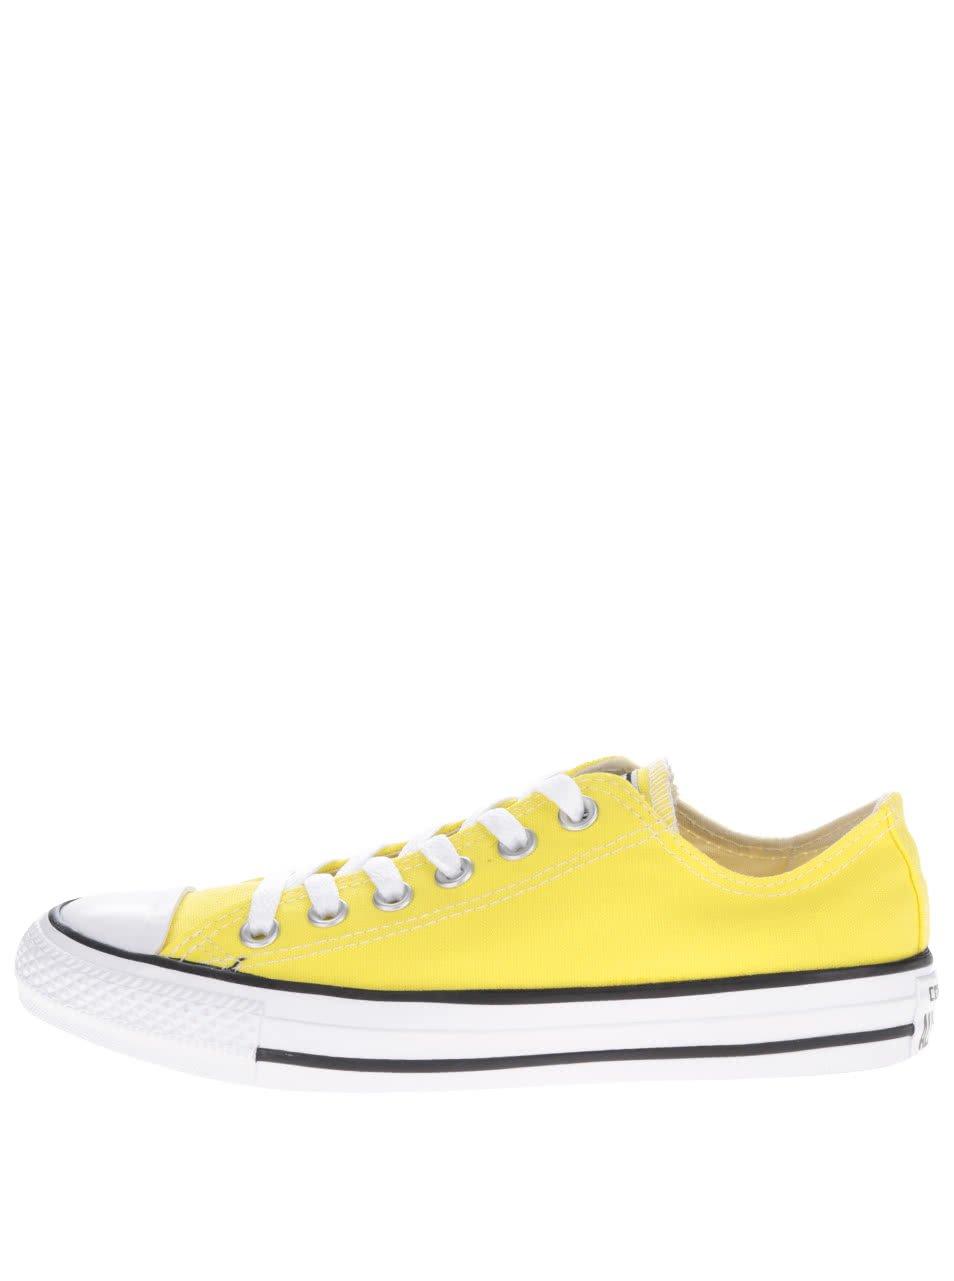 Žluté unisex tenisky Converse Chuck Taylor All Star